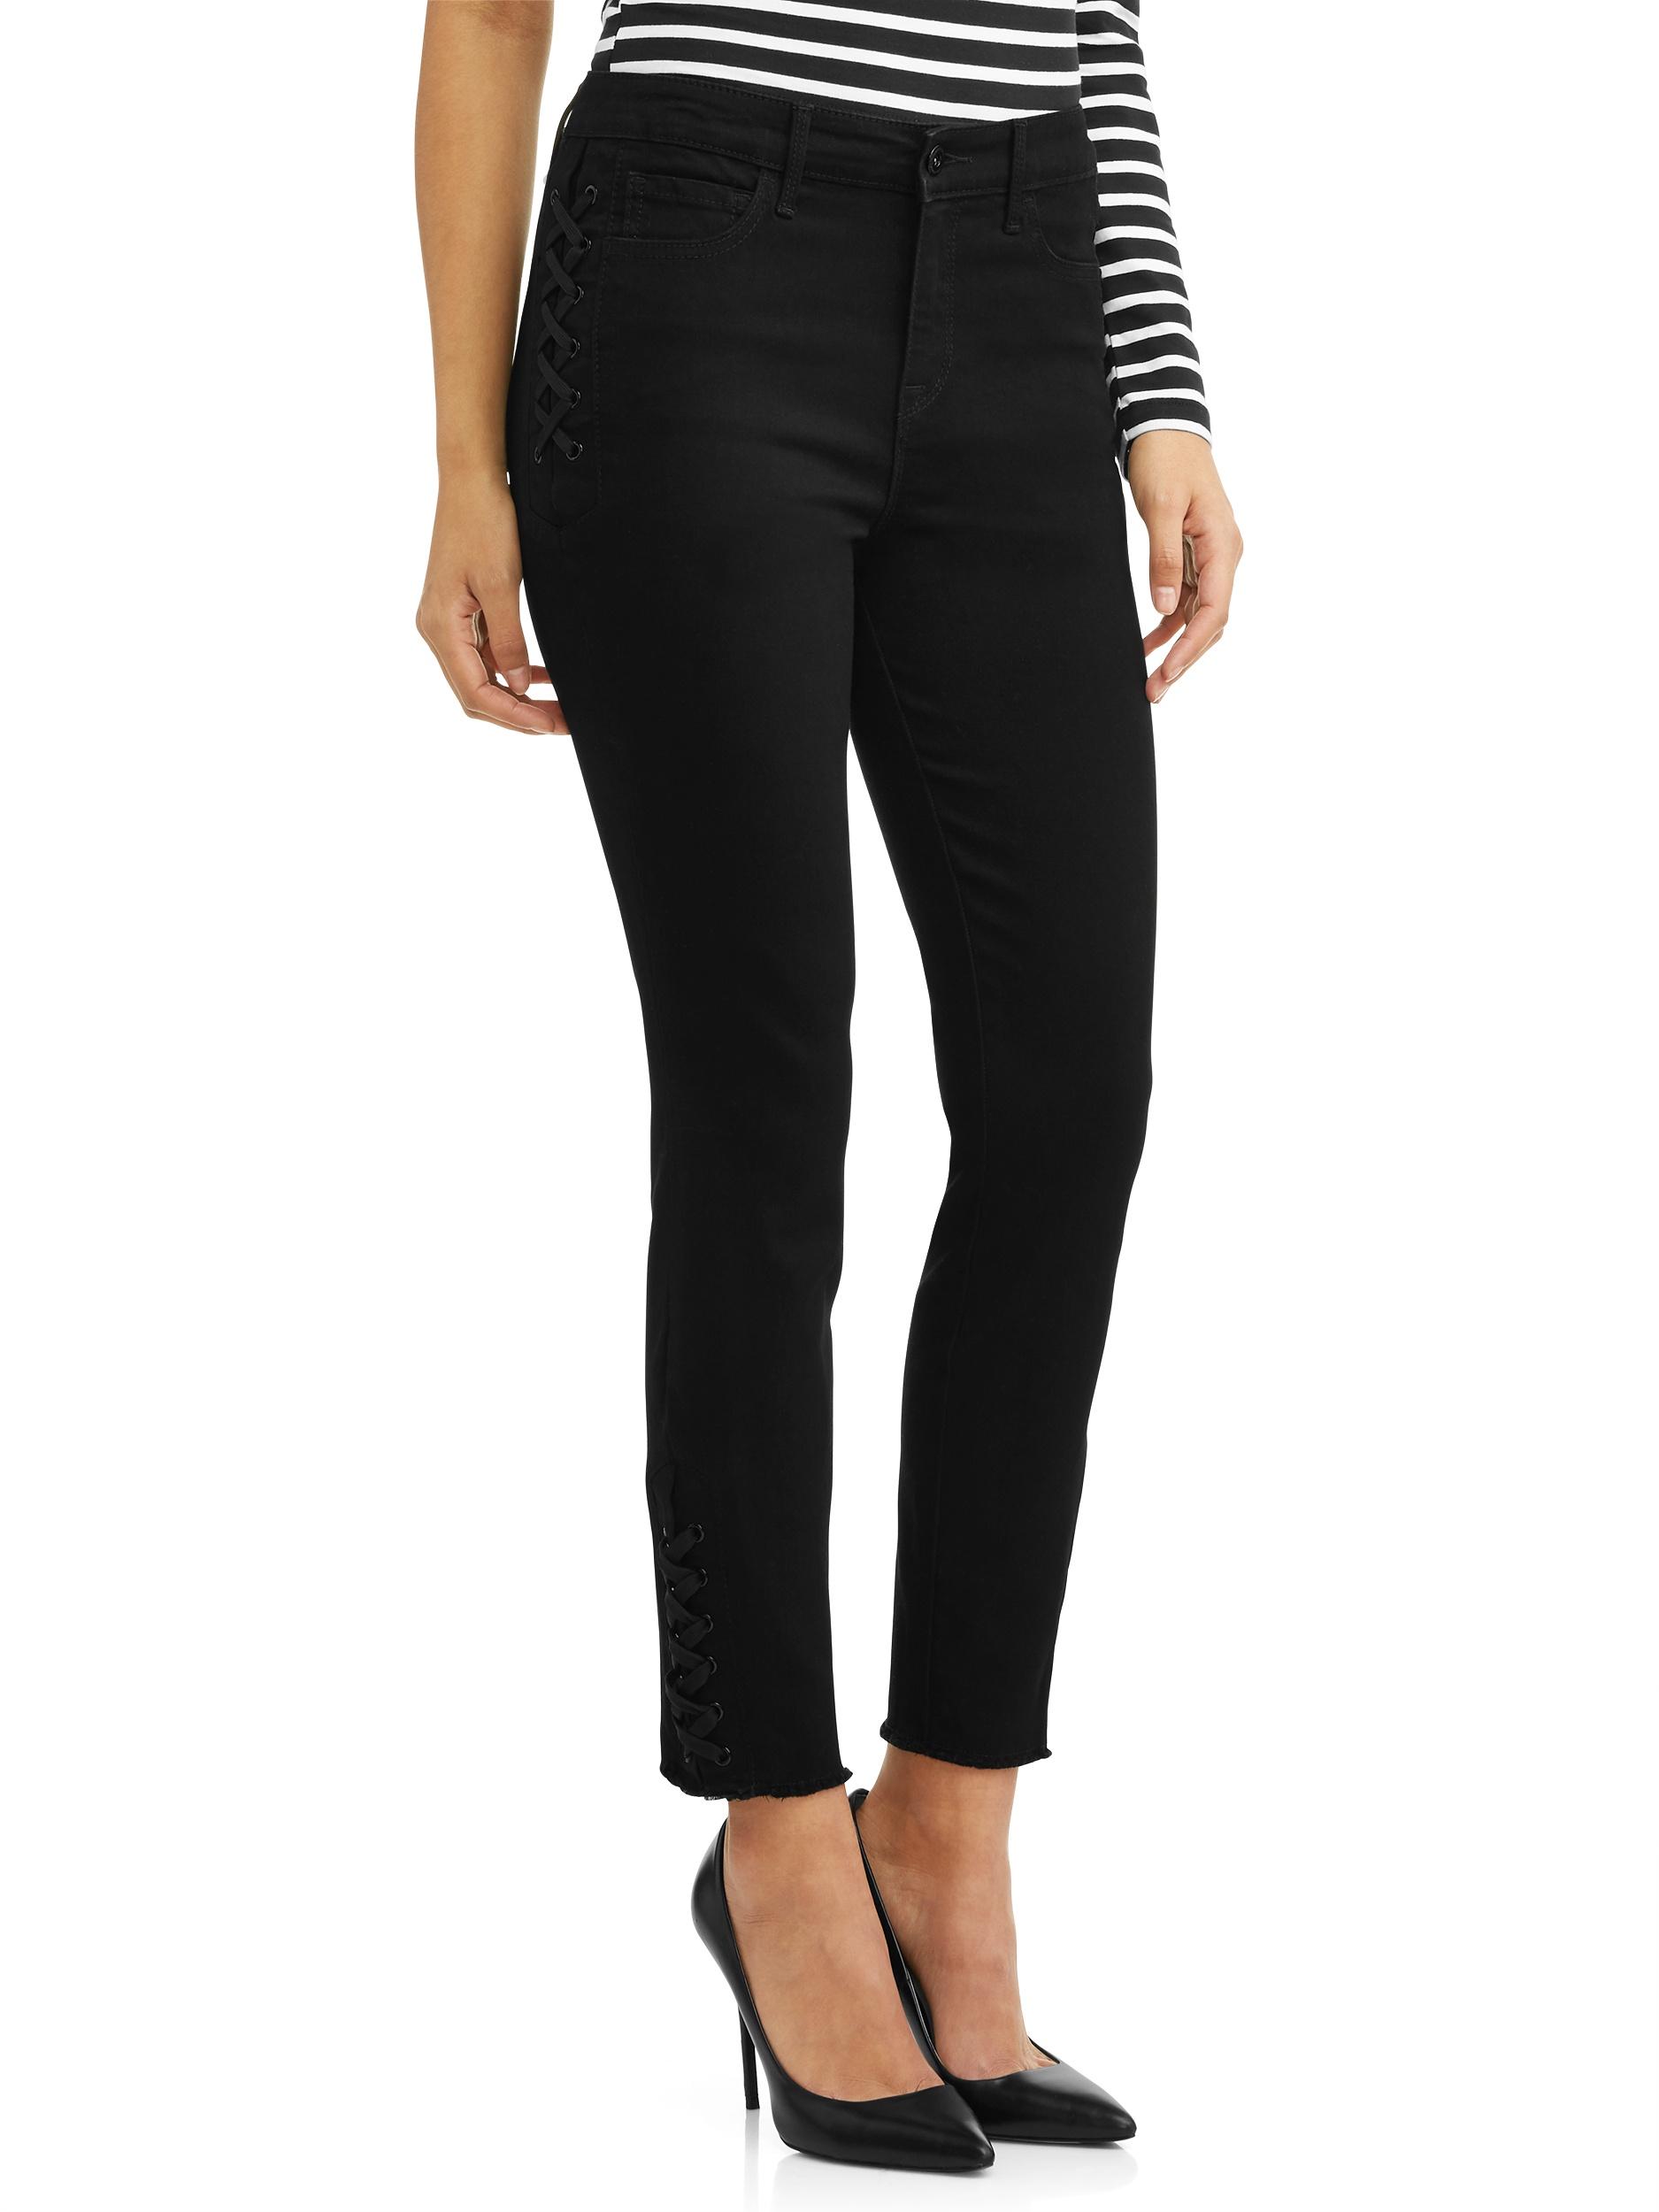 Sofía Jeans by Sofía Vergara Rosa Lace-Up Curvy Hi Rise Stretch Ankle Jean (Black)